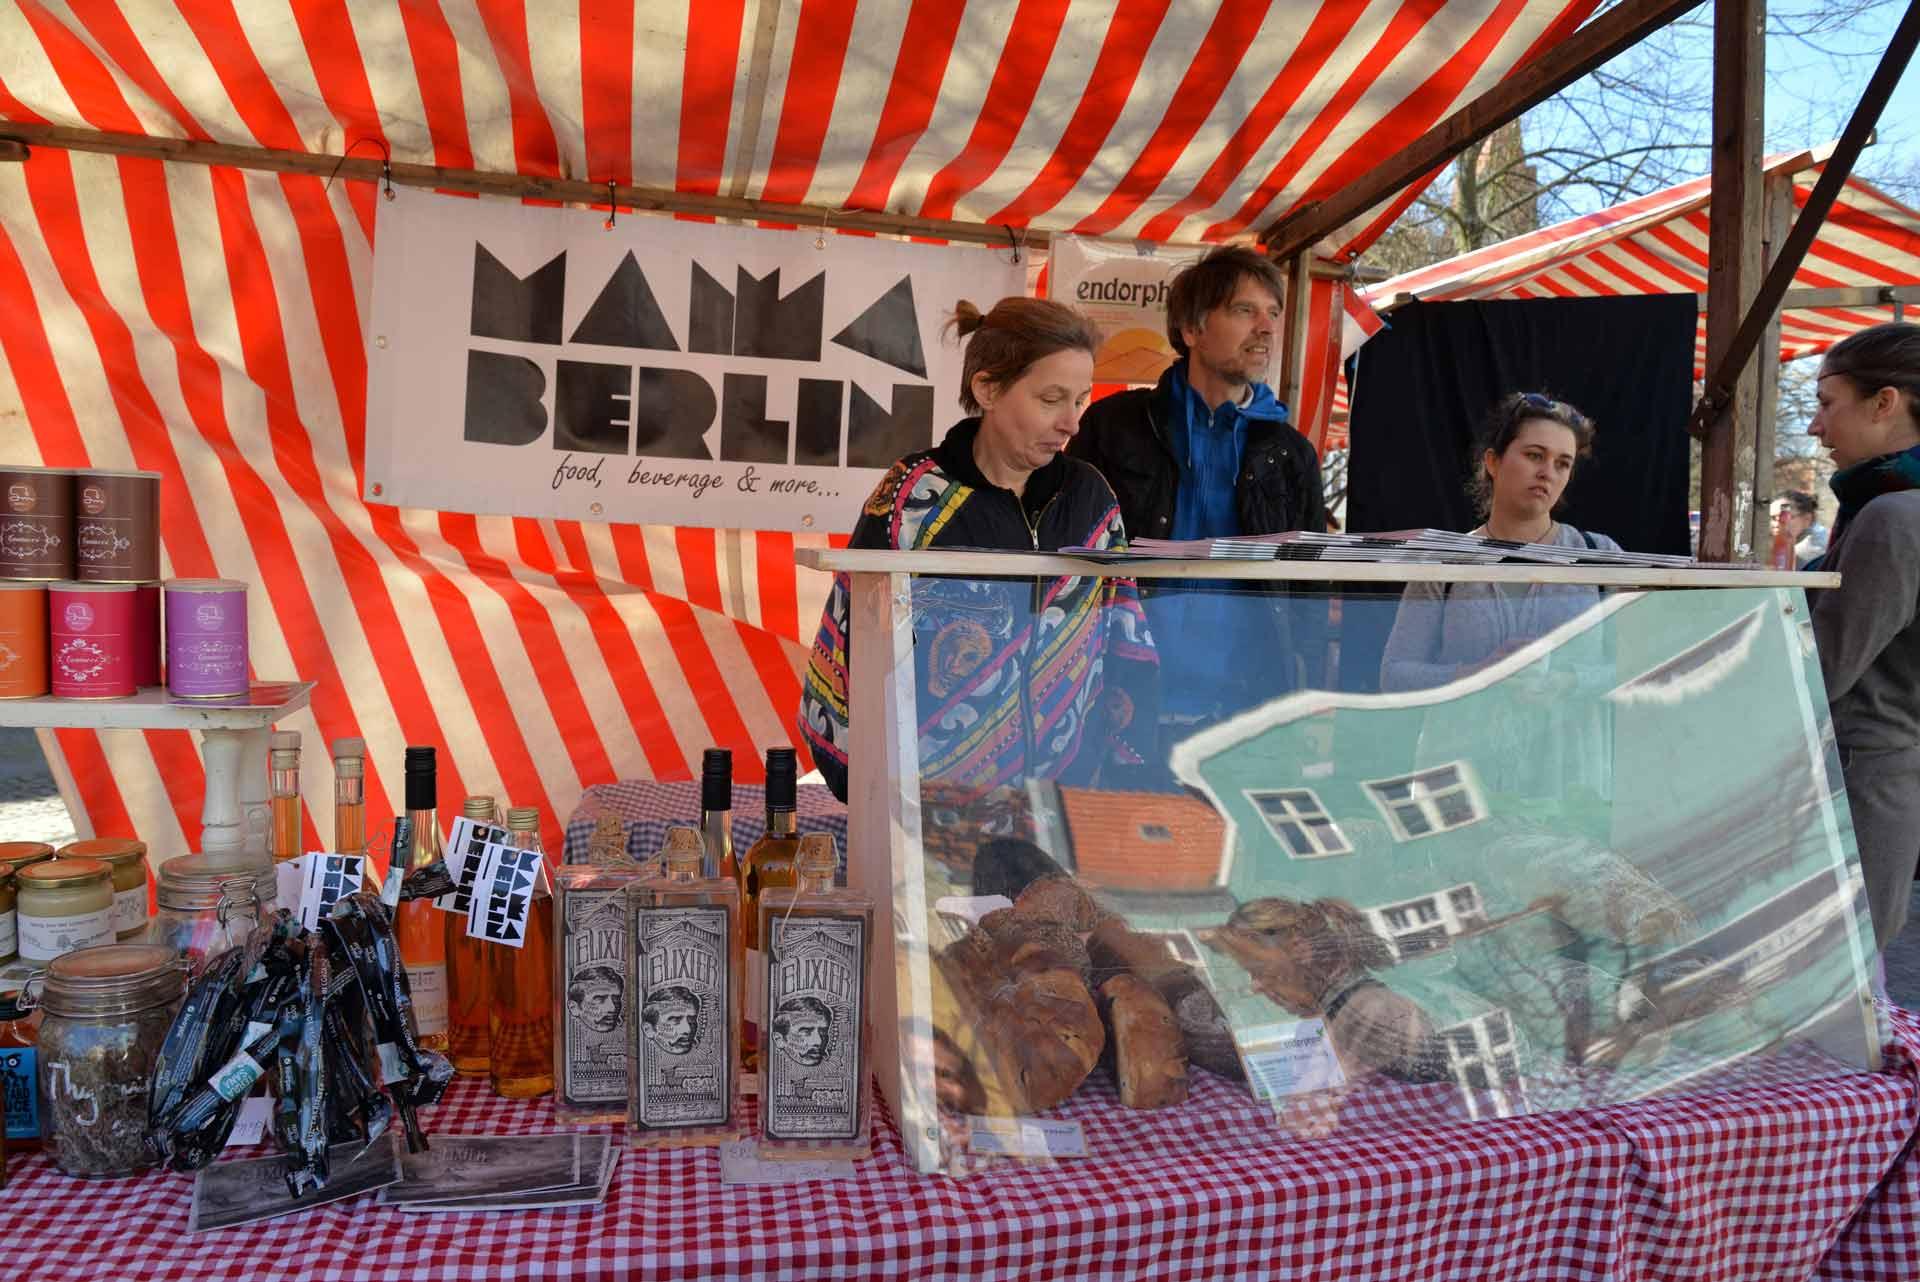 Mamma Berlin